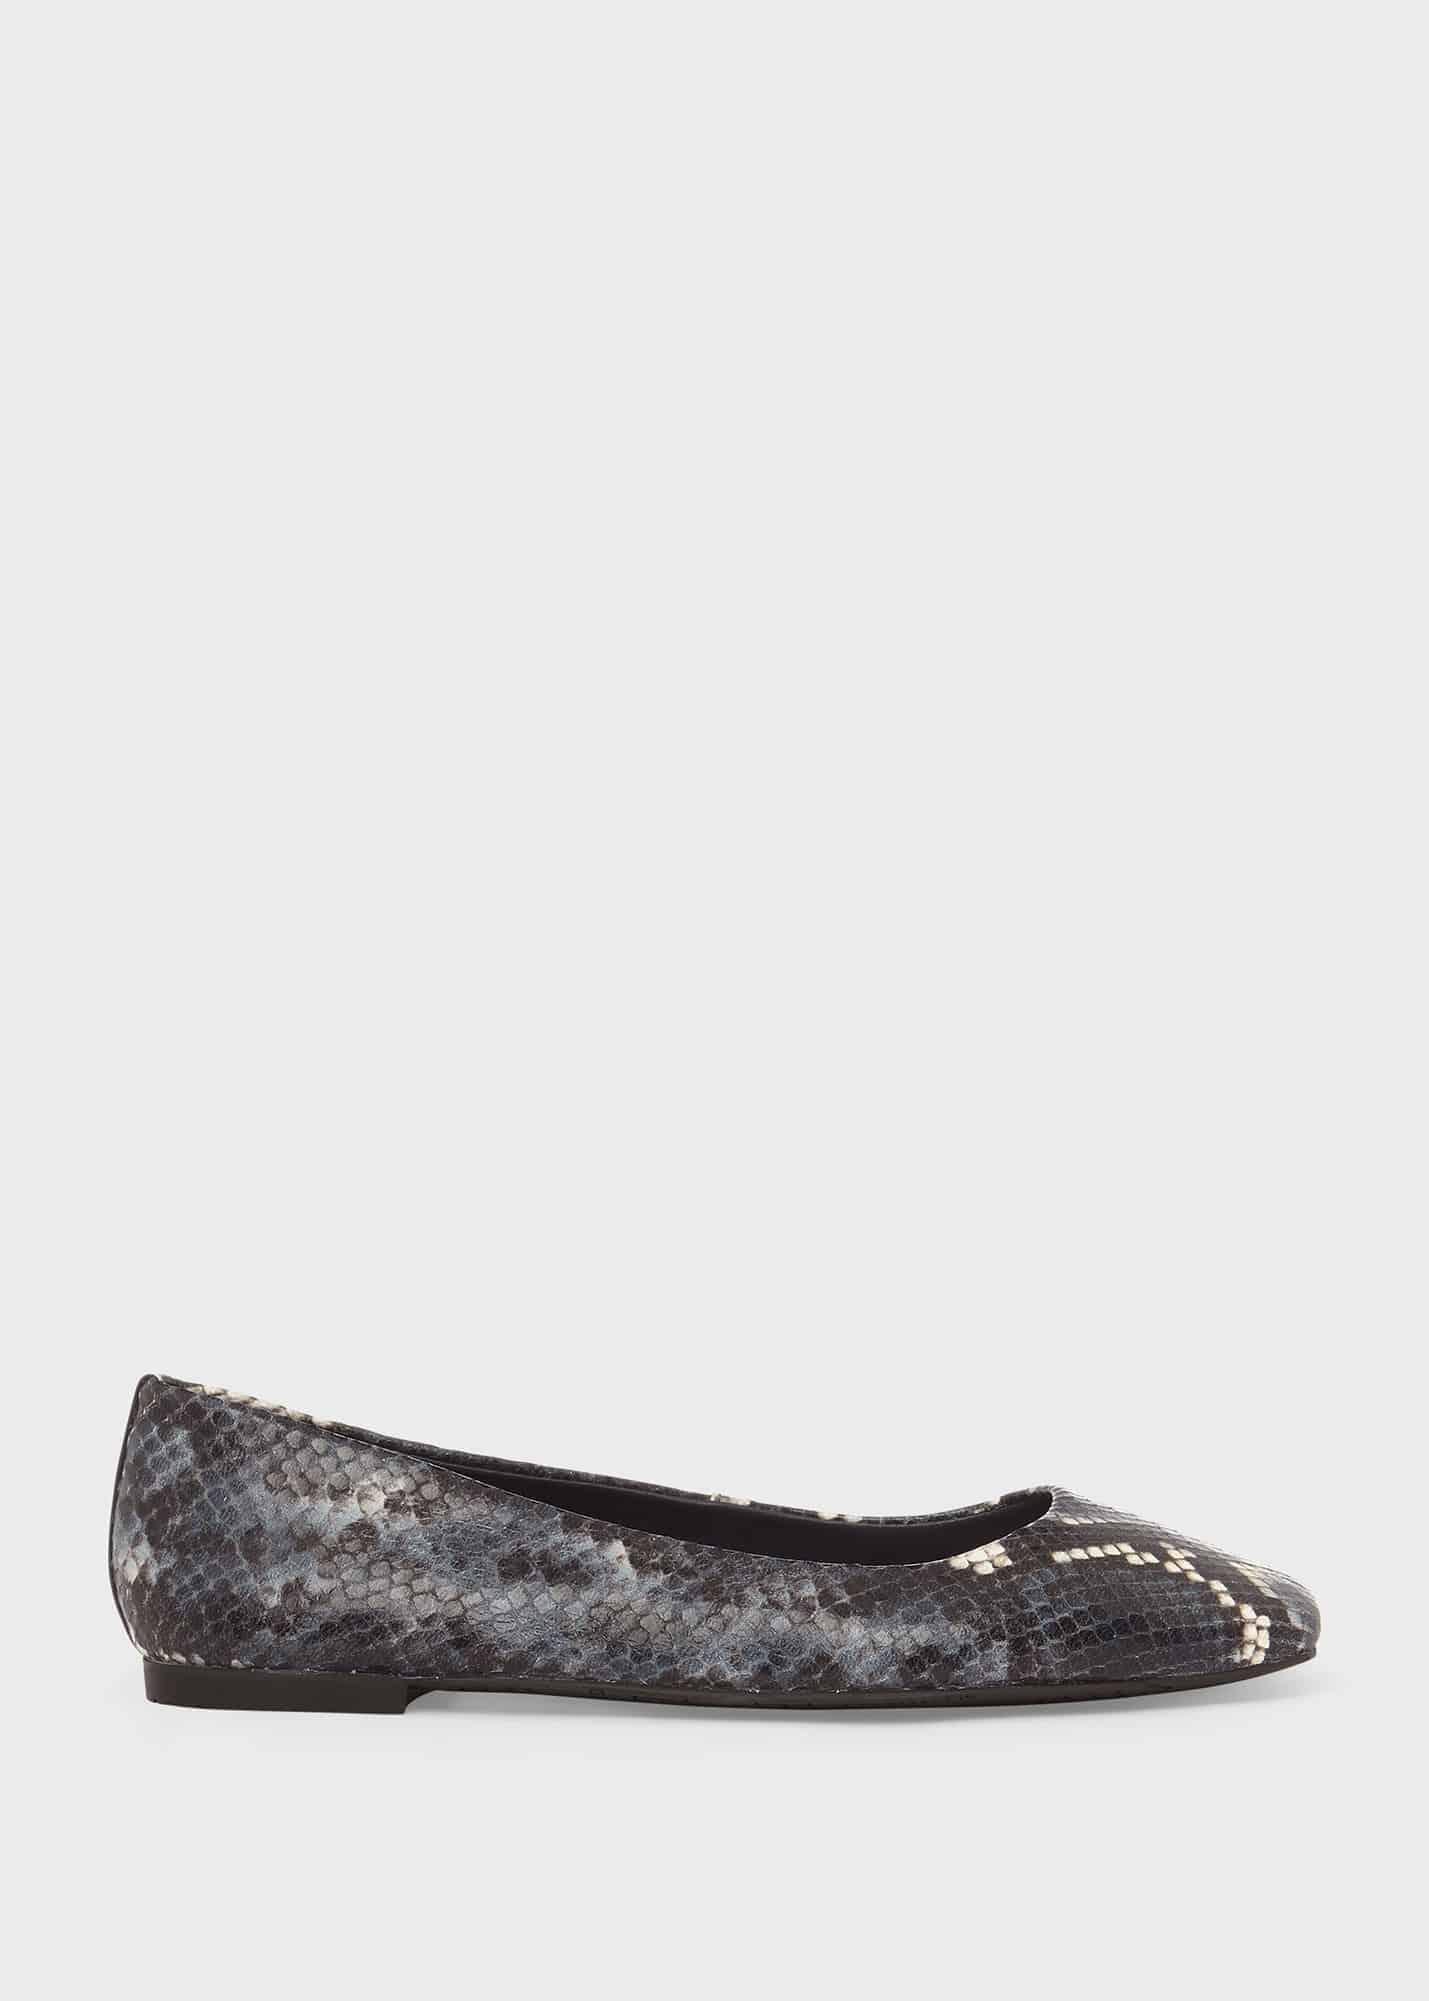 Hobbs Women Jemma Leather Flat Shoes